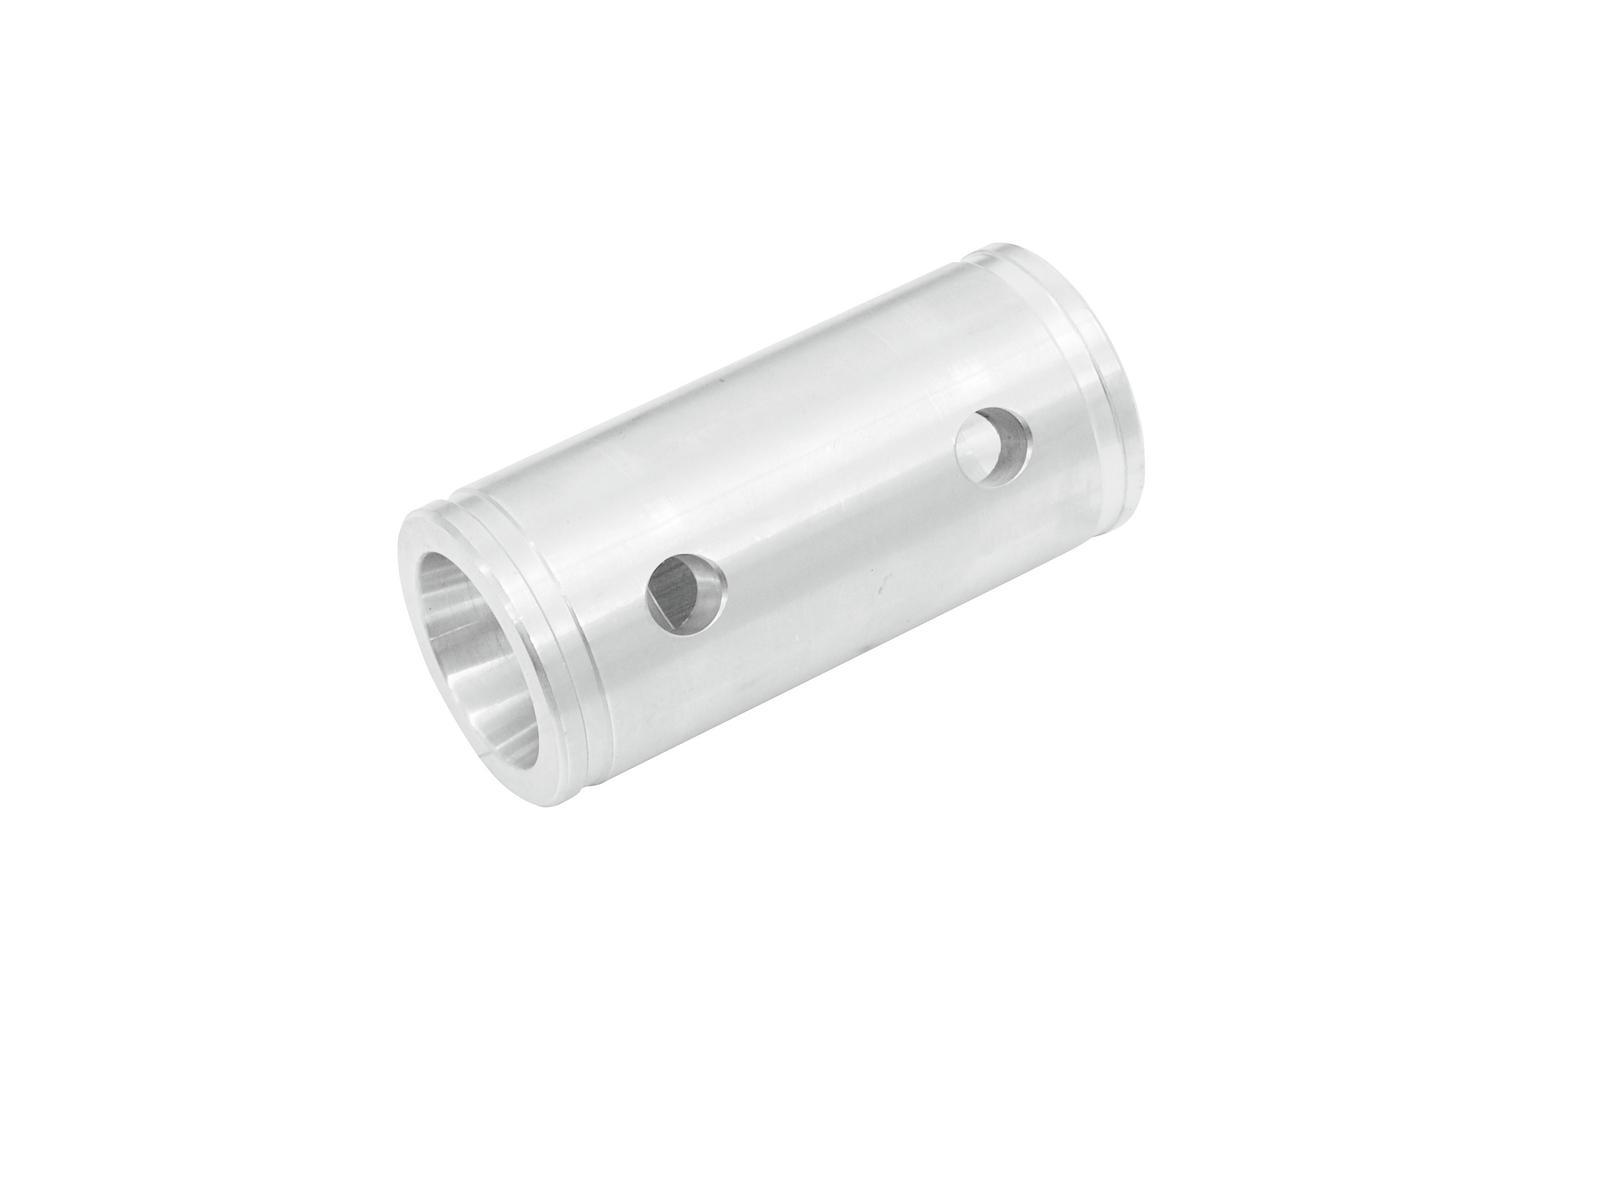 Accessori per americana traliccio truss  QUICK-LOCK ALUTRUSS GL33-ET34 Distanziale femmina105mm